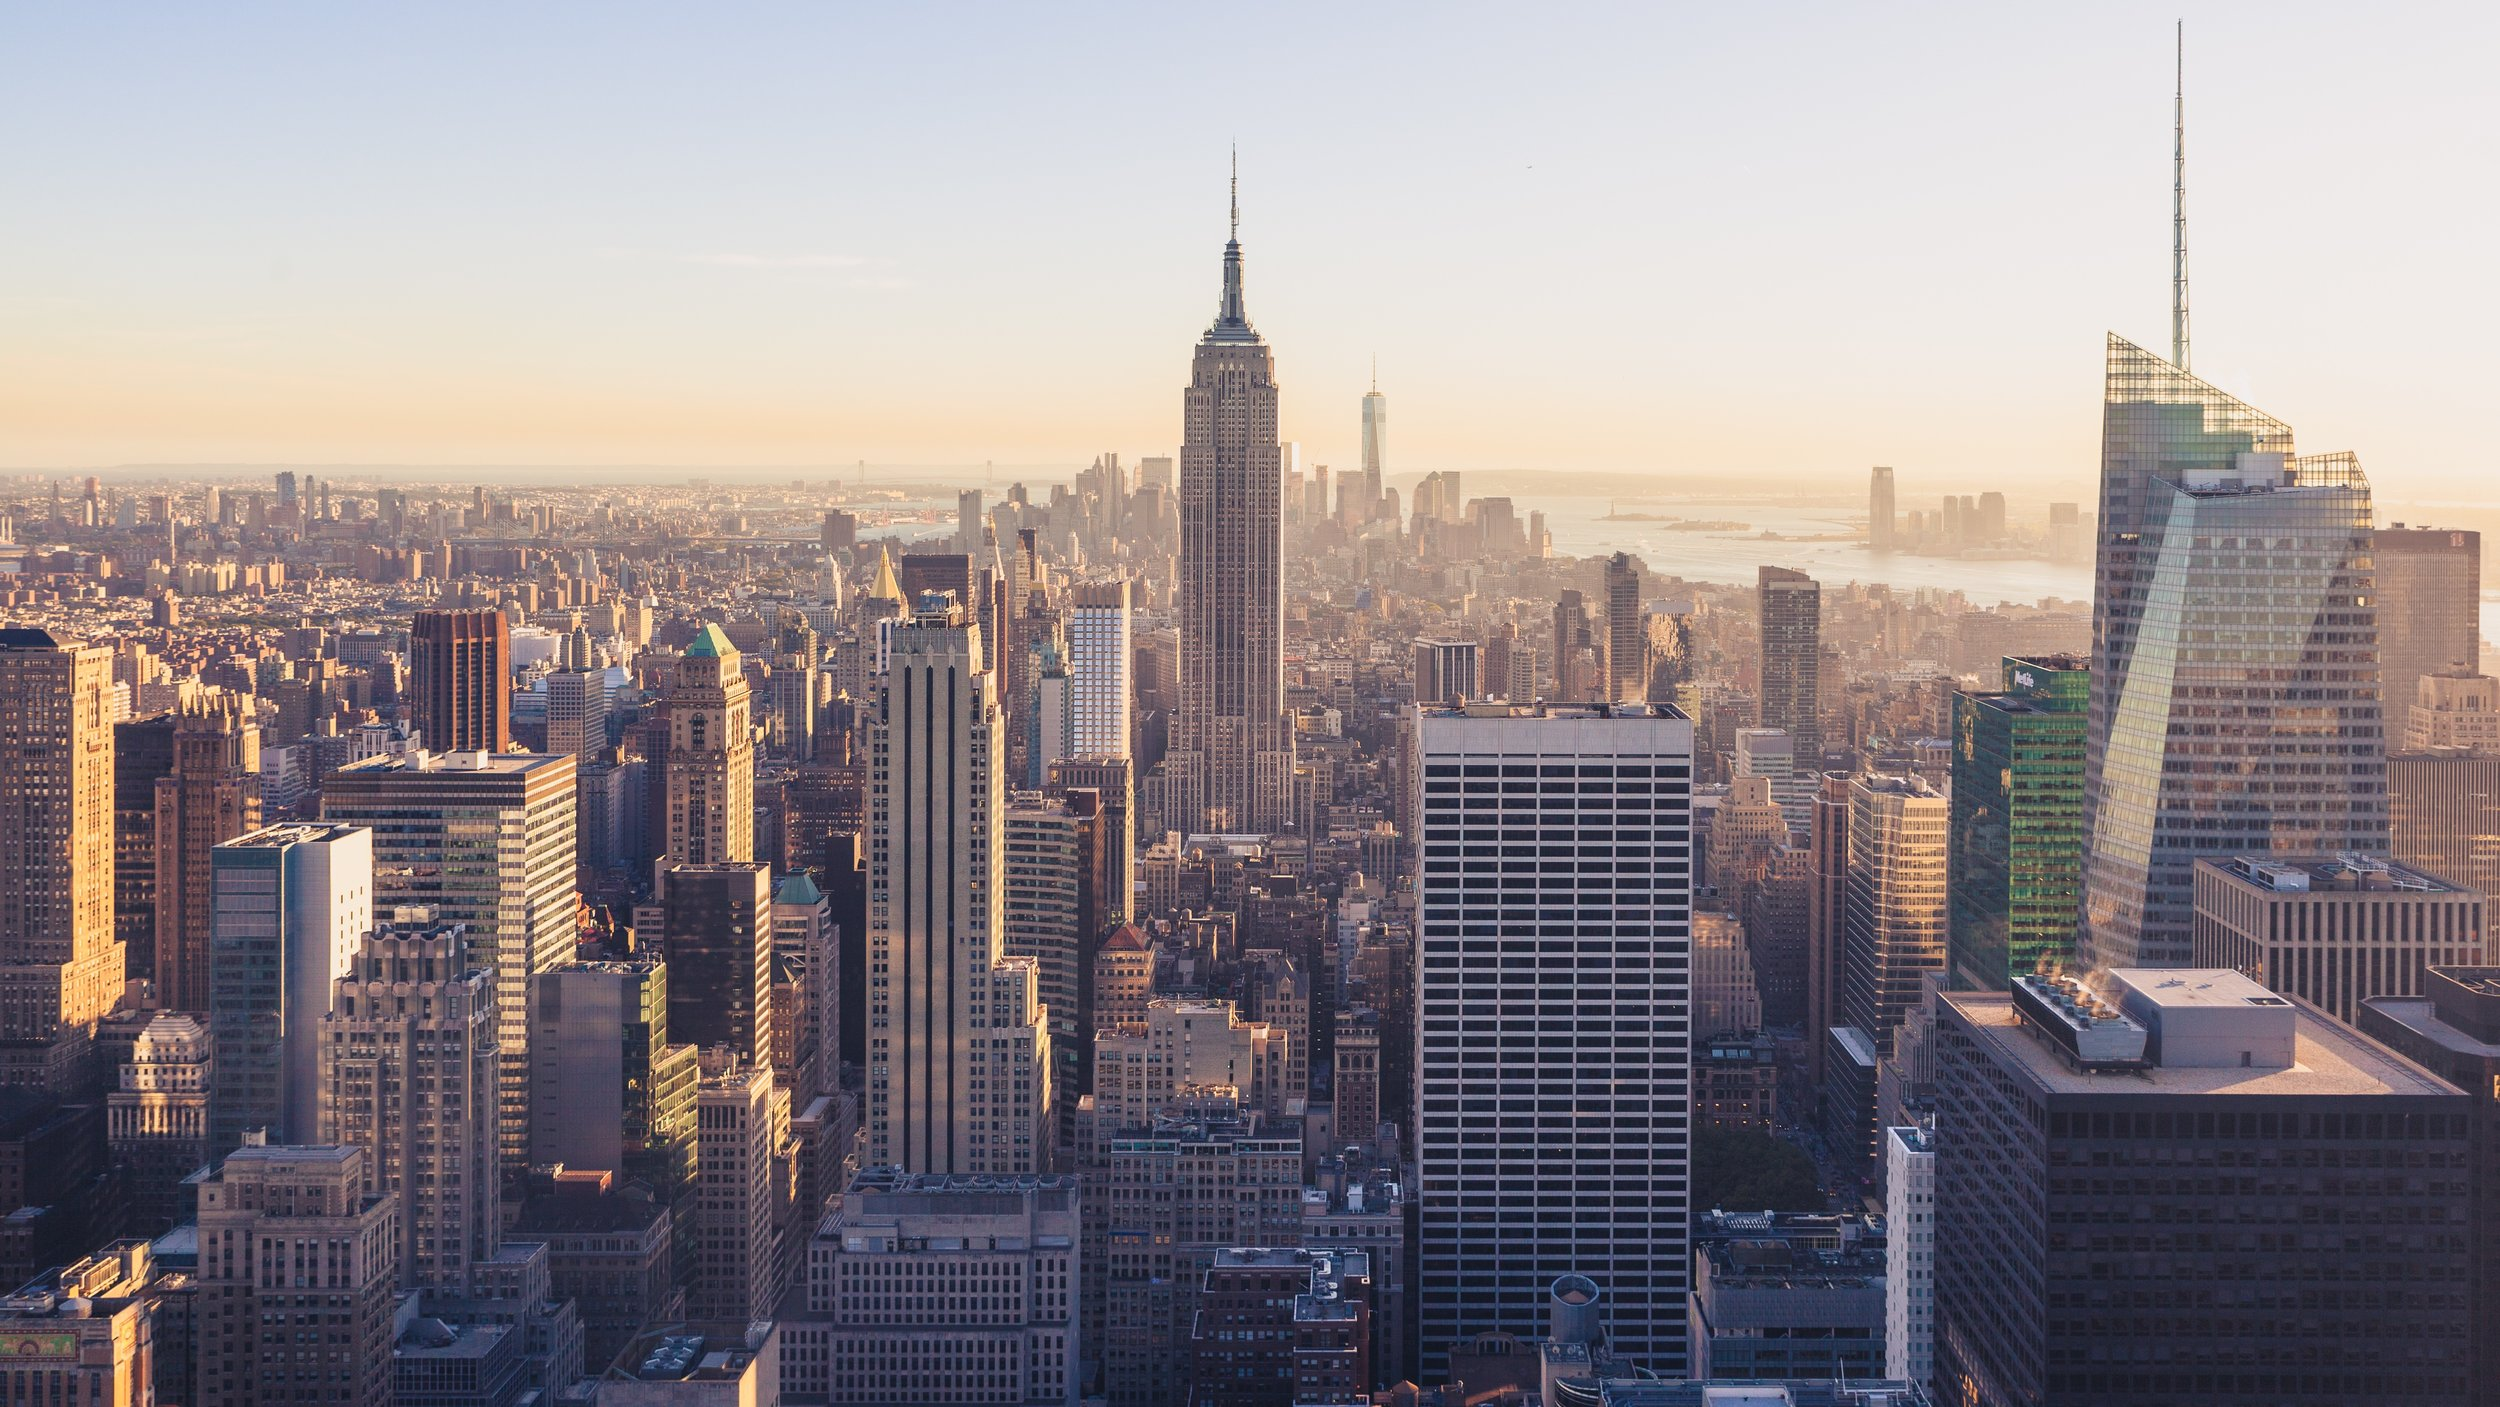 New York vs LA - fashion runway shows. 29andSeptember Studio/unsplash